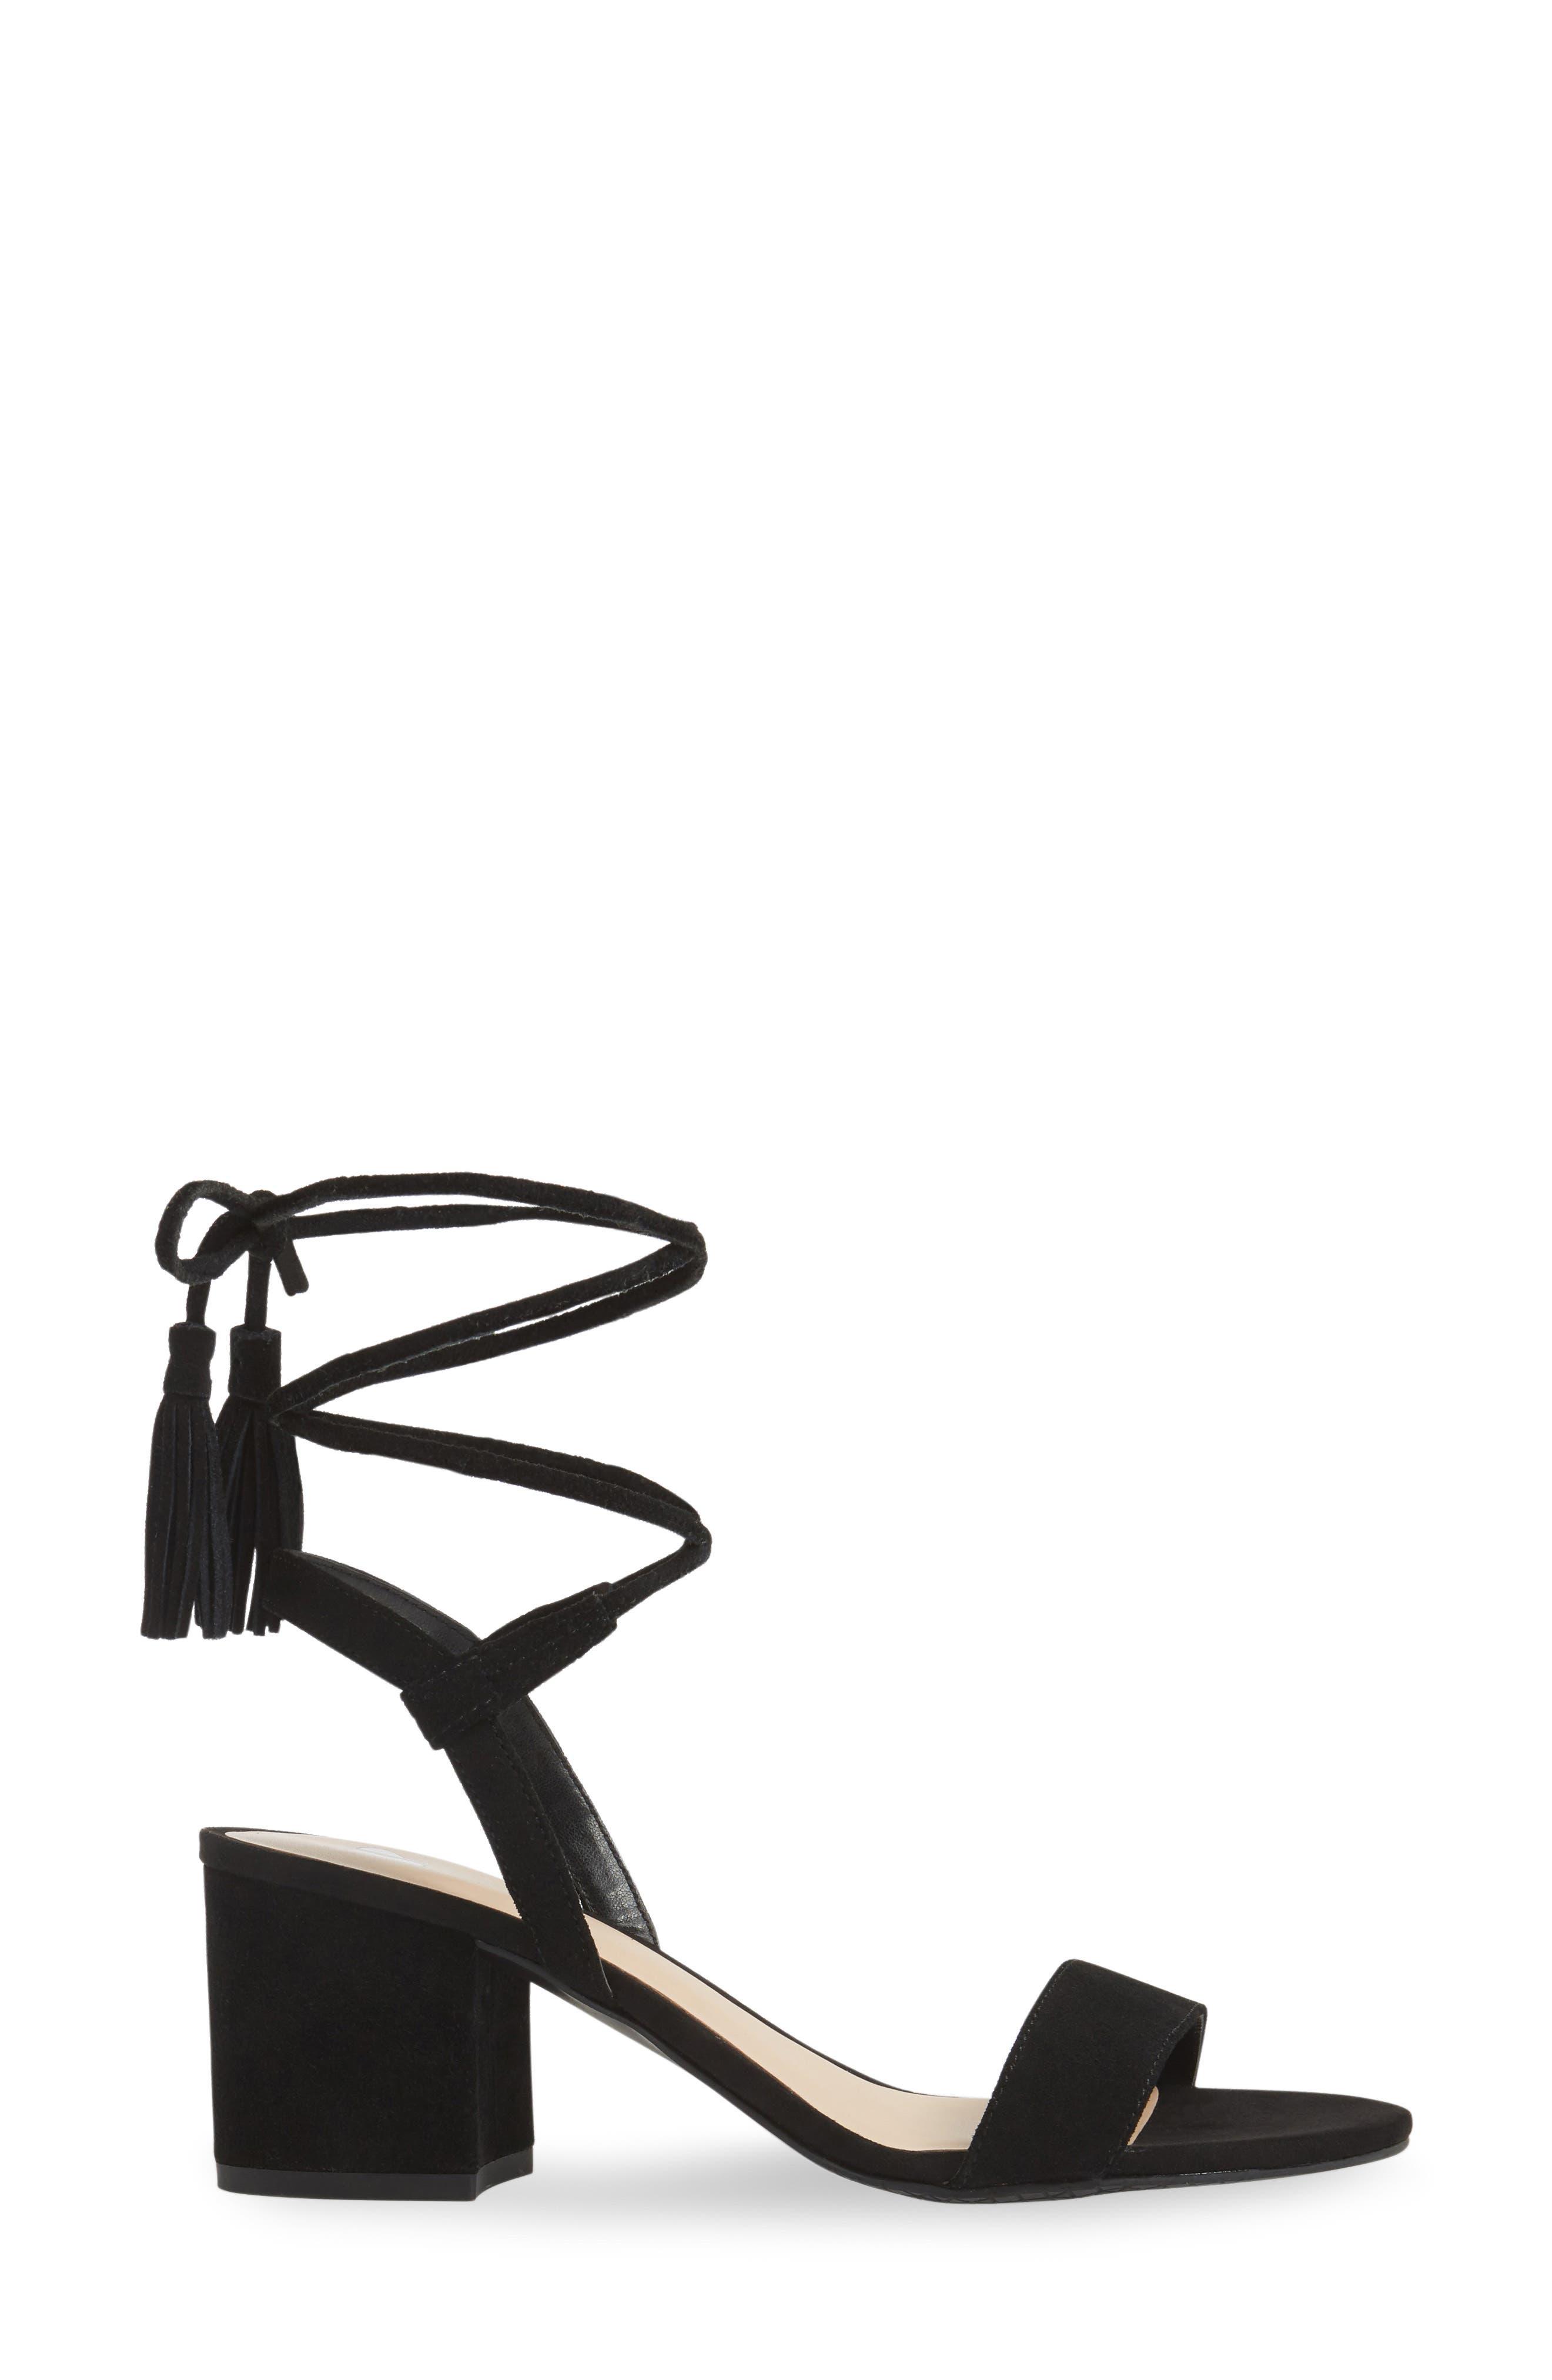 BP.,                             Karla Block Heel Ankle Wrap Sandal,                             Alternate thumbnail 3, color,                             001